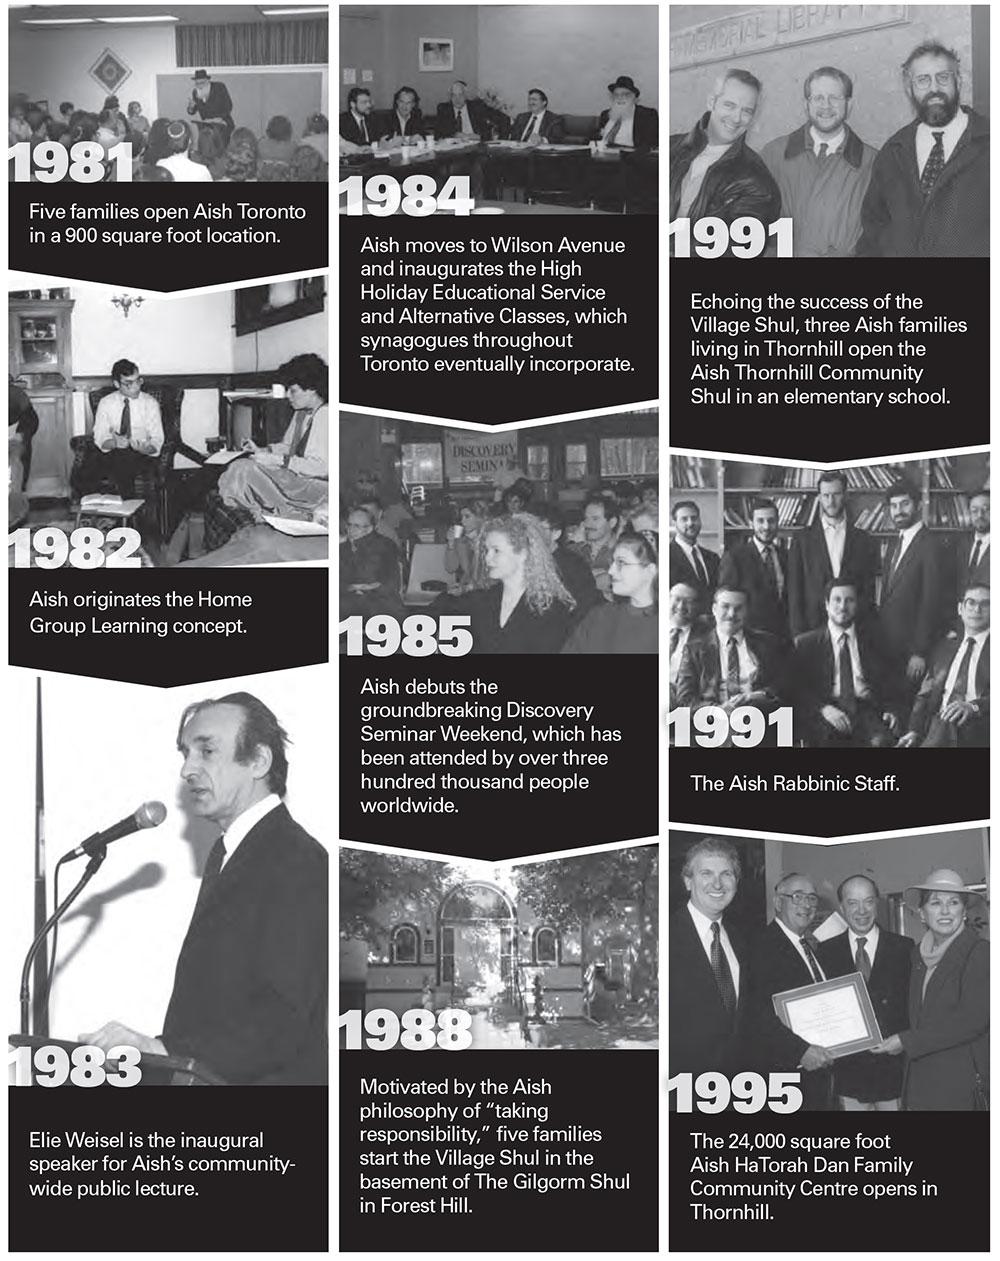 Timeline-1-2.jpg